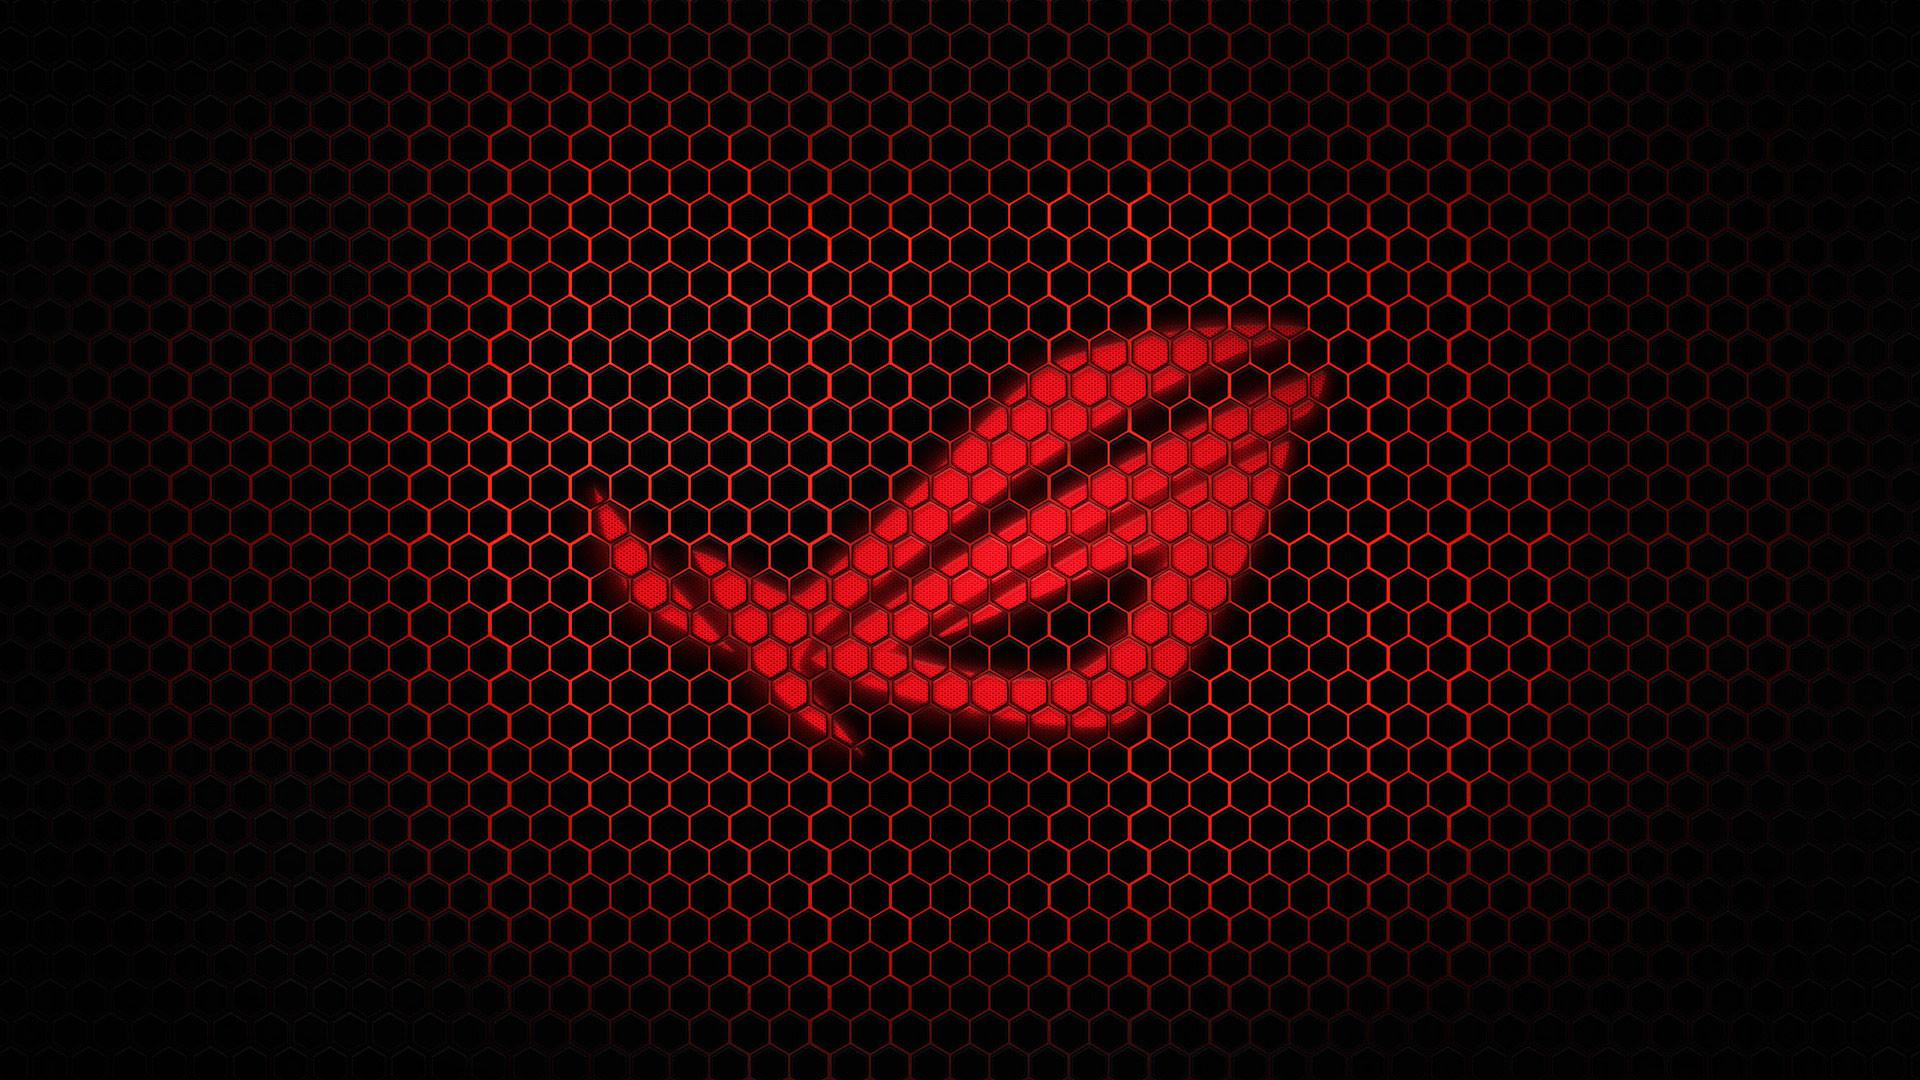 hd pics photos red technology logo red desktop background wallpaper